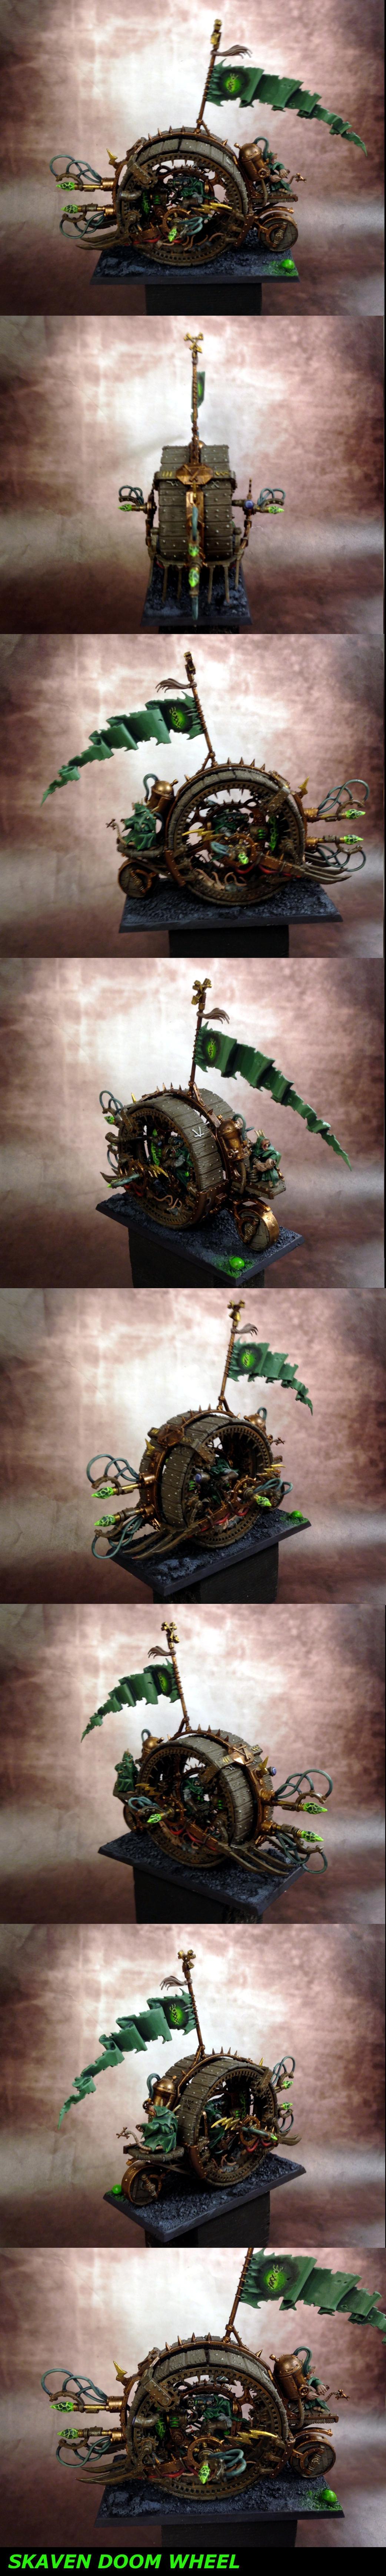 Aosol, Doom Wheel, Skaven, Warhammer Fantasy